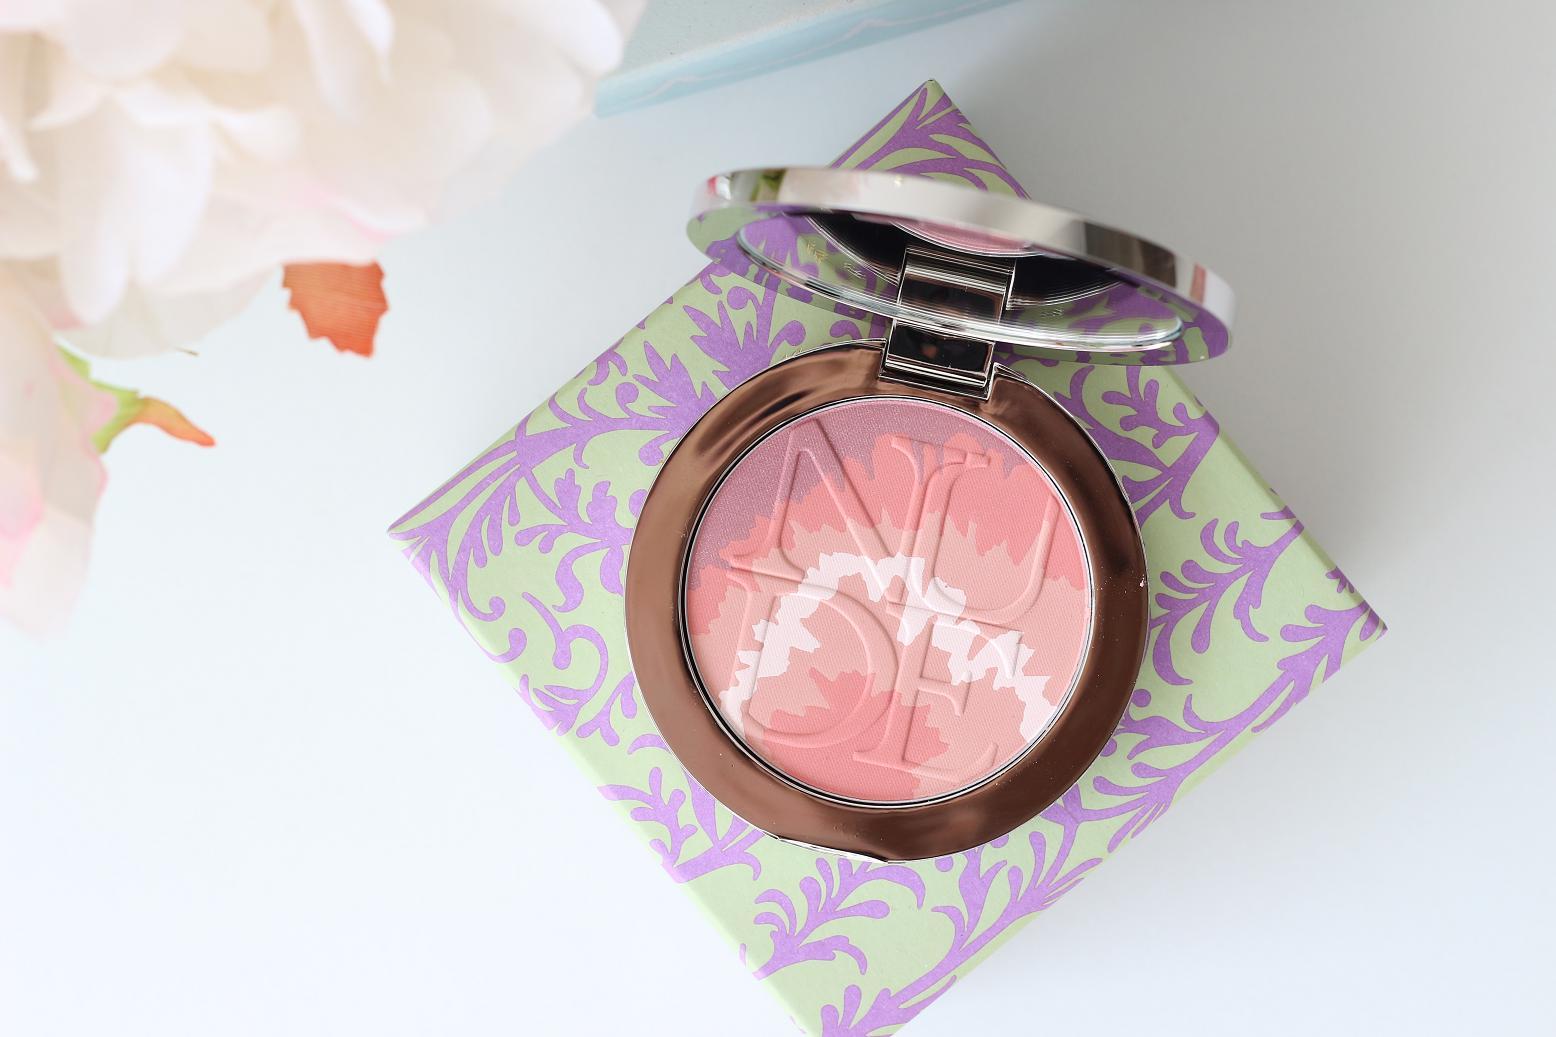 Dior Tie Dye blush Pink Sunrise